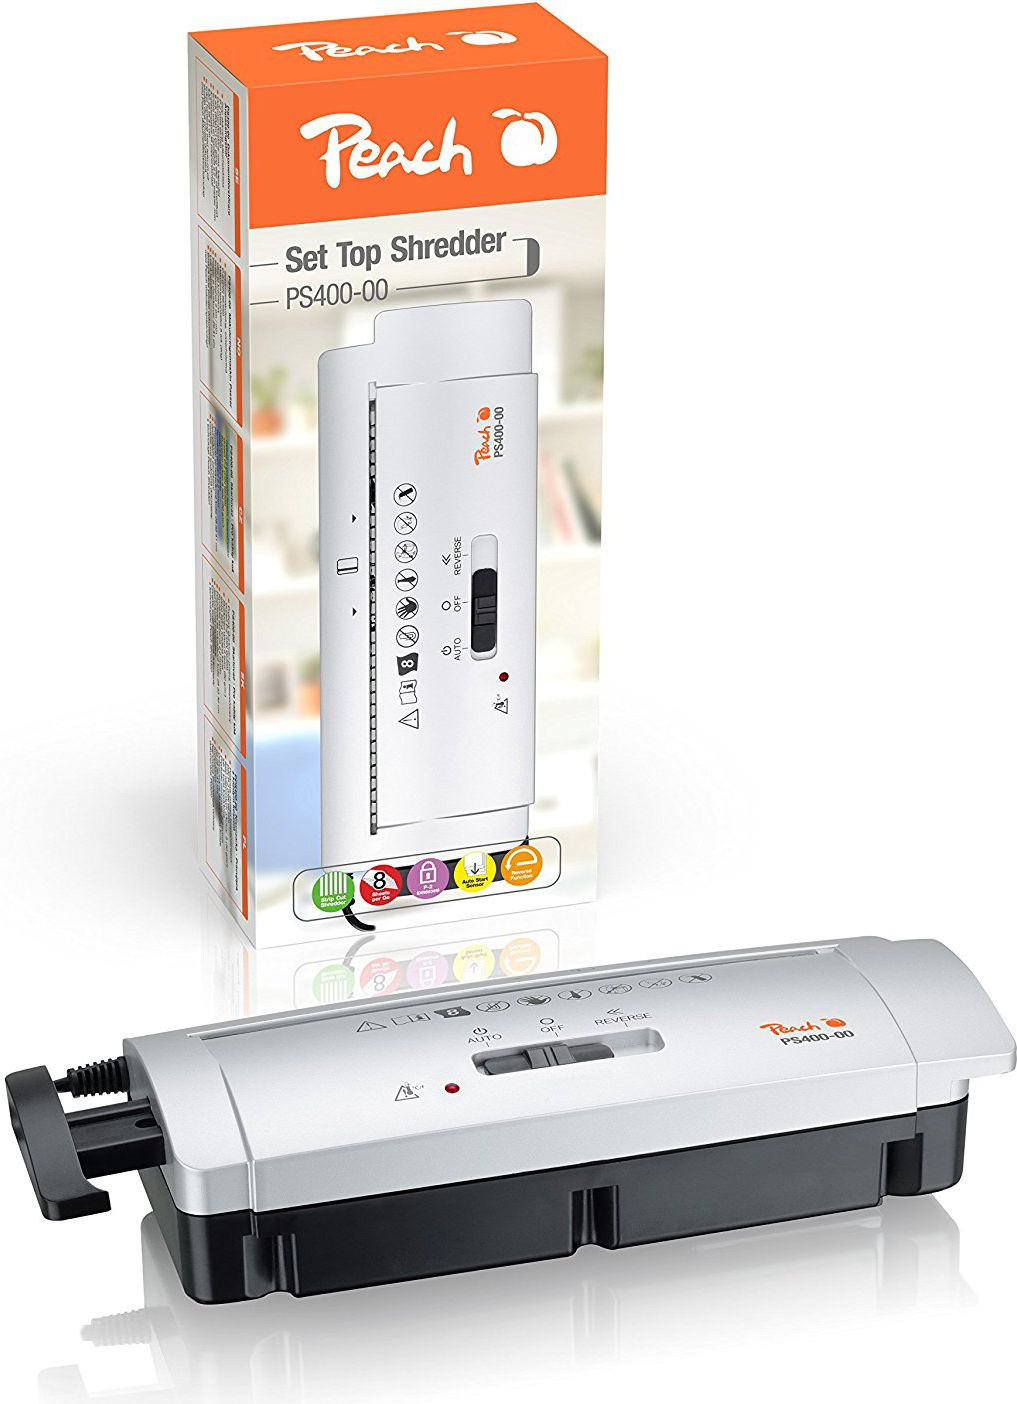 Shredder PS400-00, strips 7mm, 6 sheets, adaptable to std basket 28-35 cm, P-1 papīra smalcinātājs